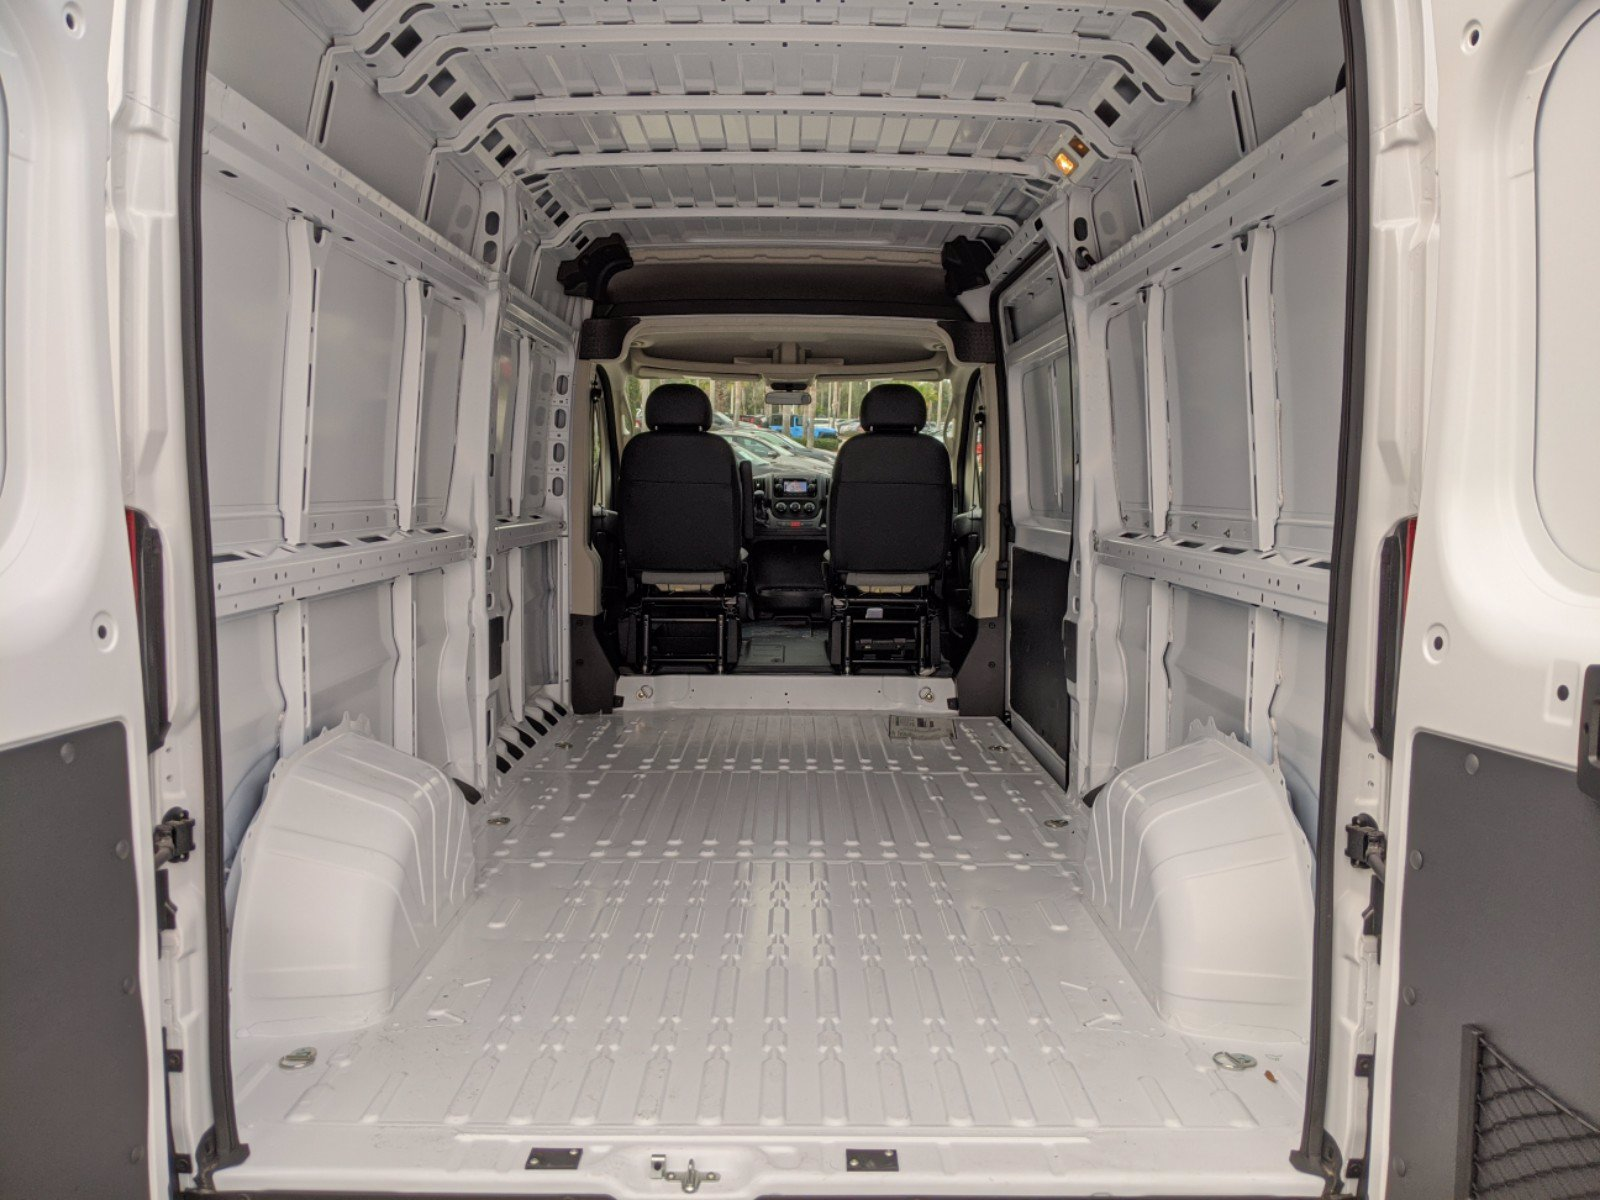 2021 Ram ProMaster 3500 FWD, Empty Cargo Van #R21178 - photo 1